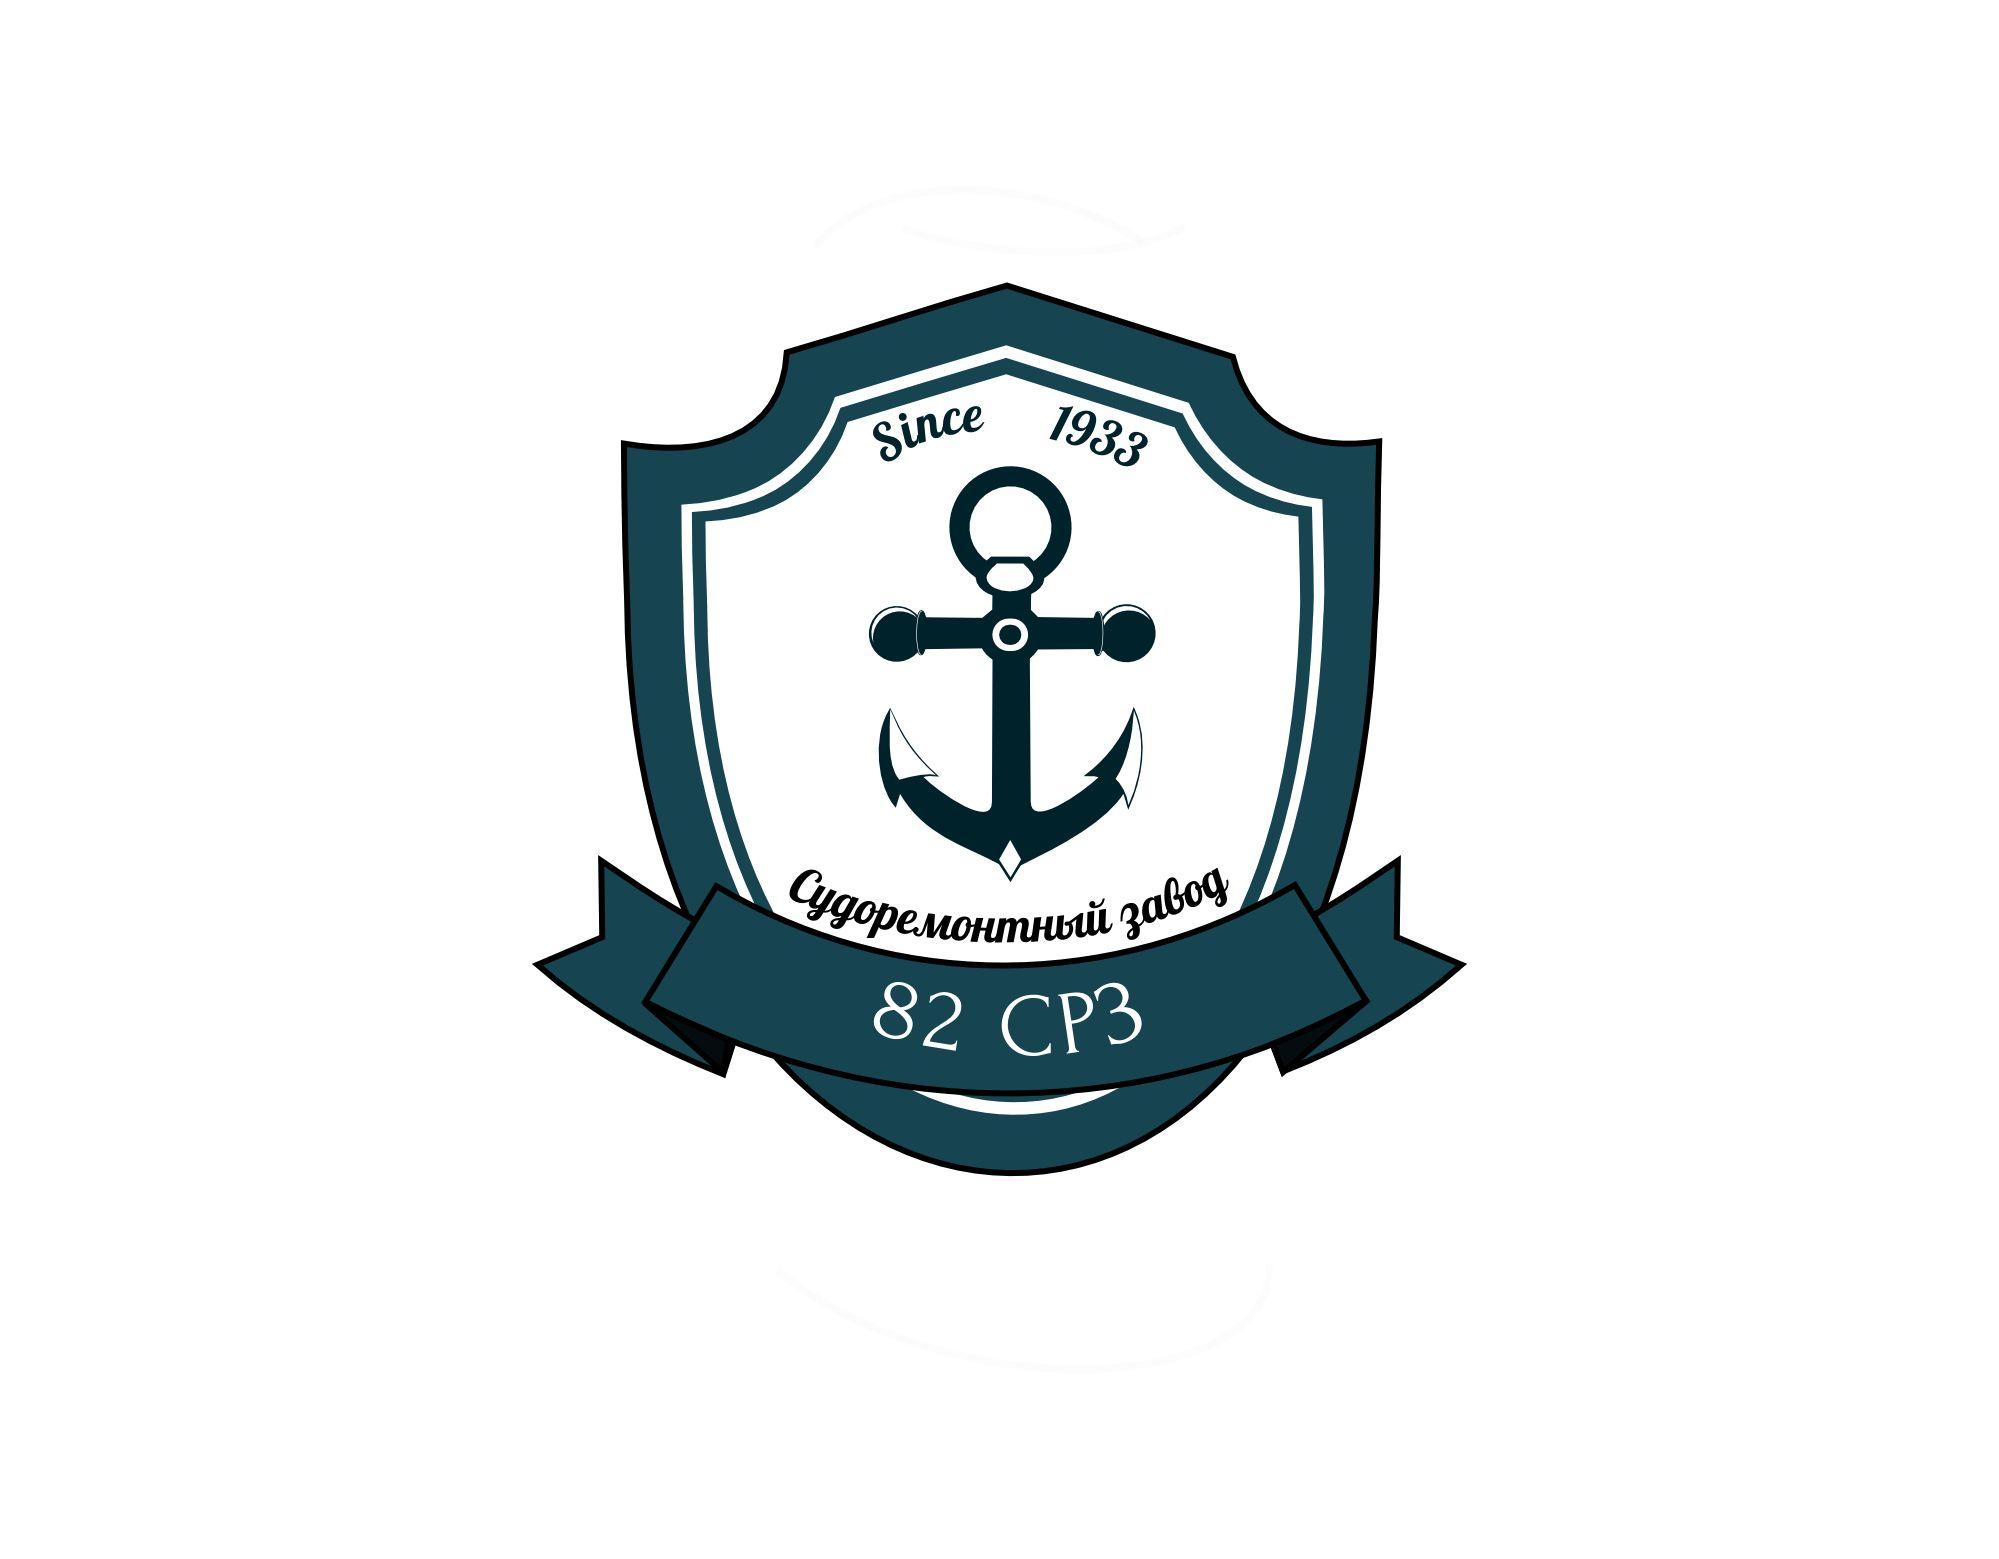 Логотип для судоремонтного завода - дизайнер qwertymax2